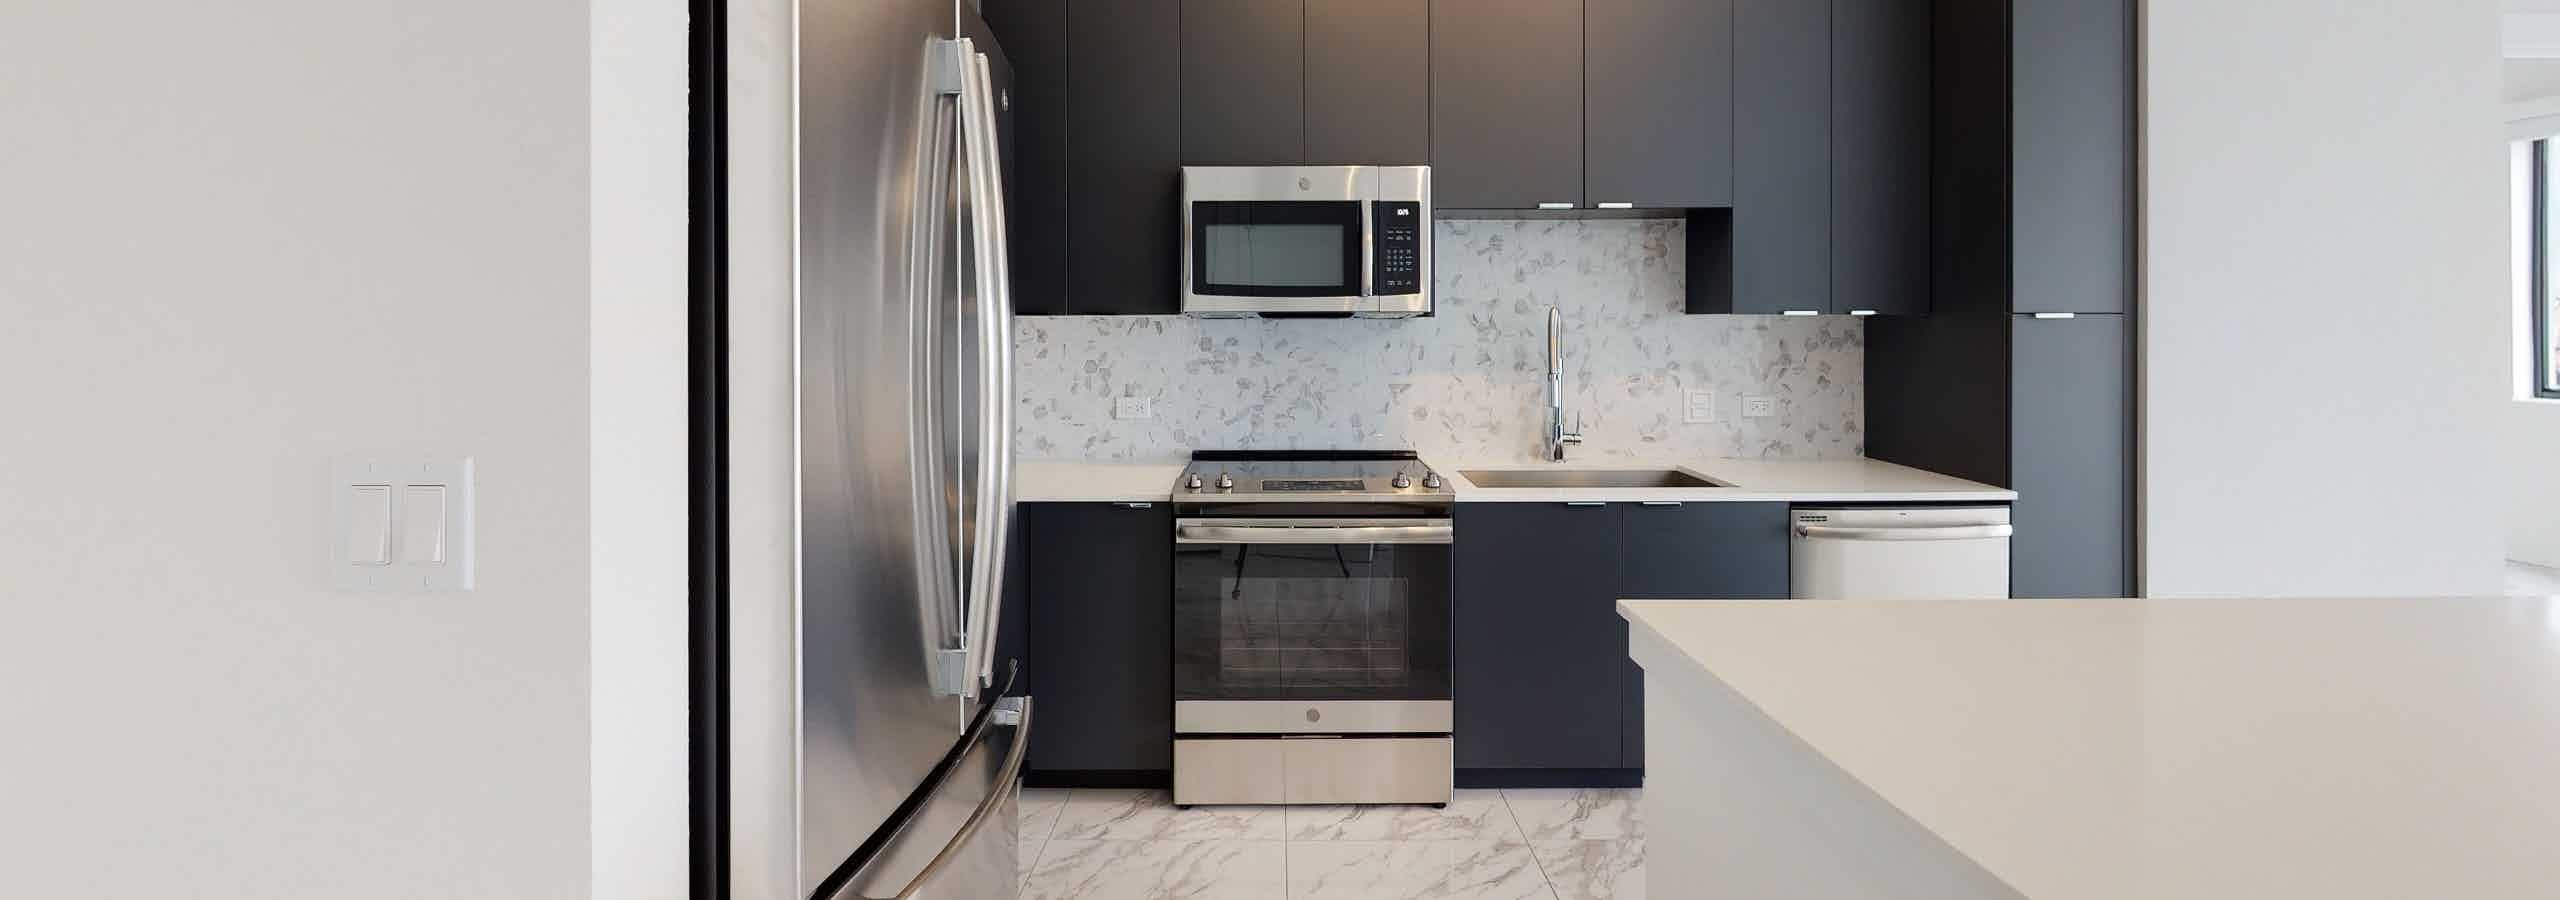 Island kitchen with quartz countertop